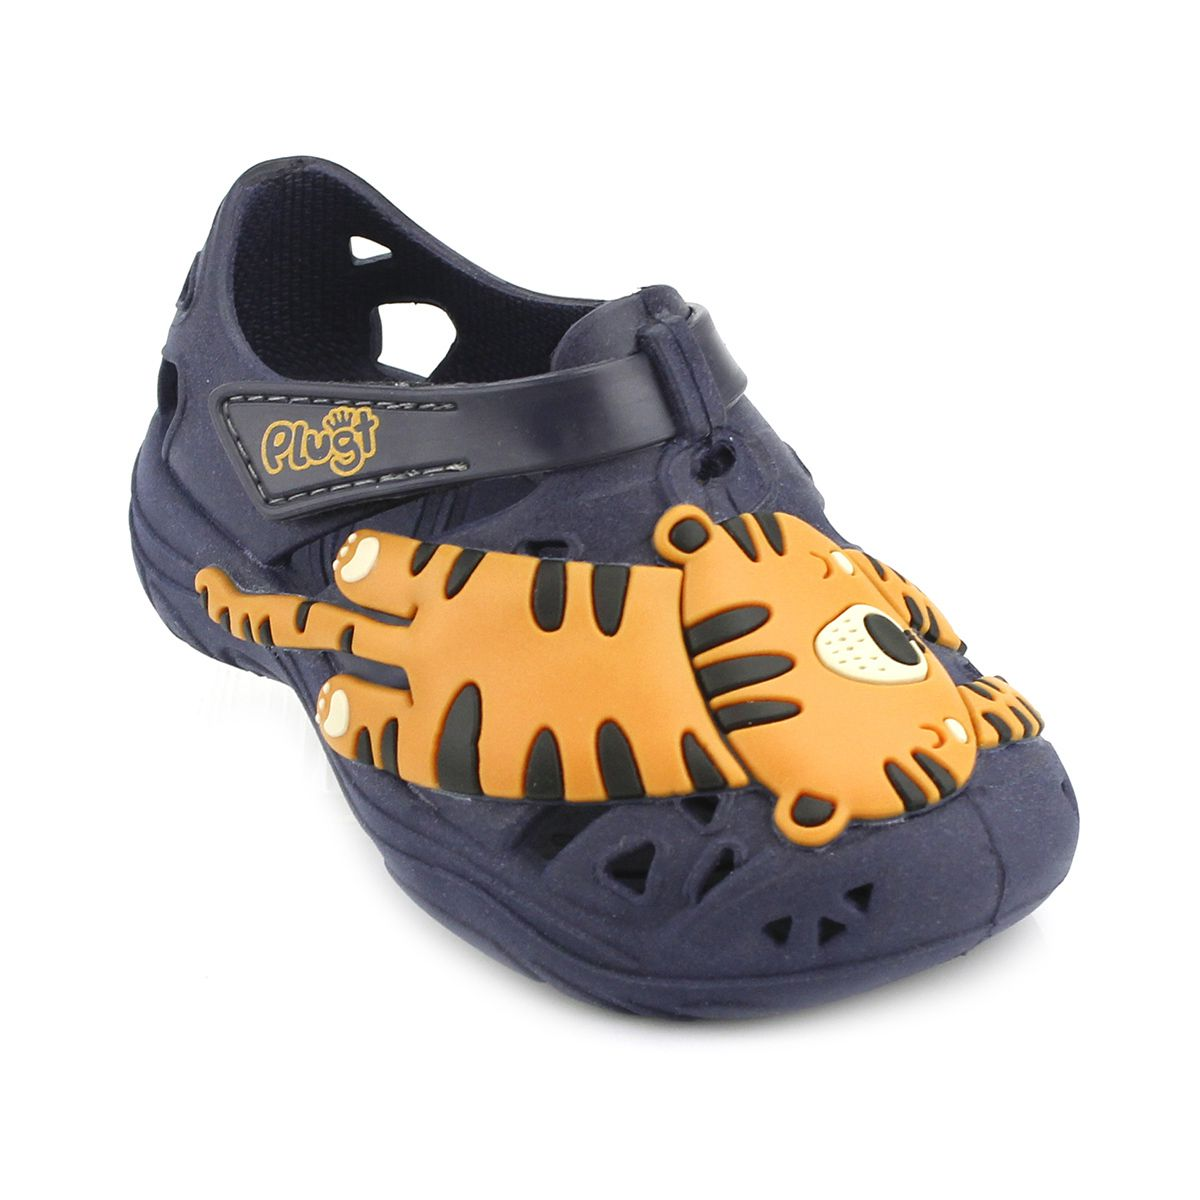 Babuche Plugt Tigre Marinho V